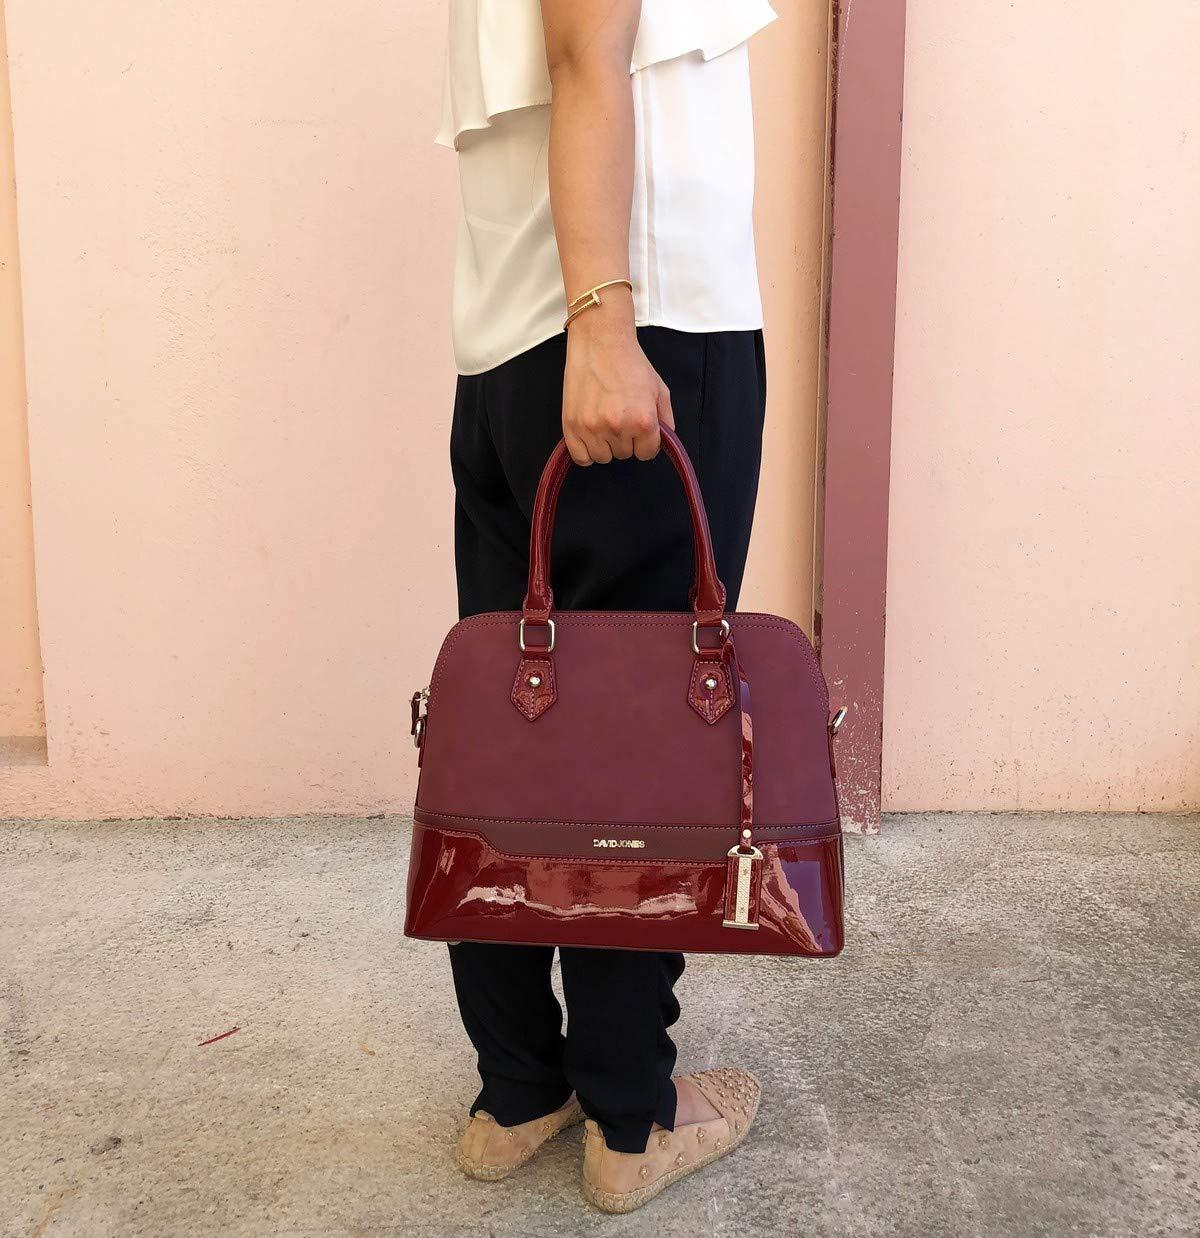 David Jones - Women s Bugatti Handbag - Patent Glossy PU Leather Bowling Bag  - Top Handle Shoulder Crossbody Bag Stripes - Elegant Duffel Tote Bag ... ed13a0cb574c0